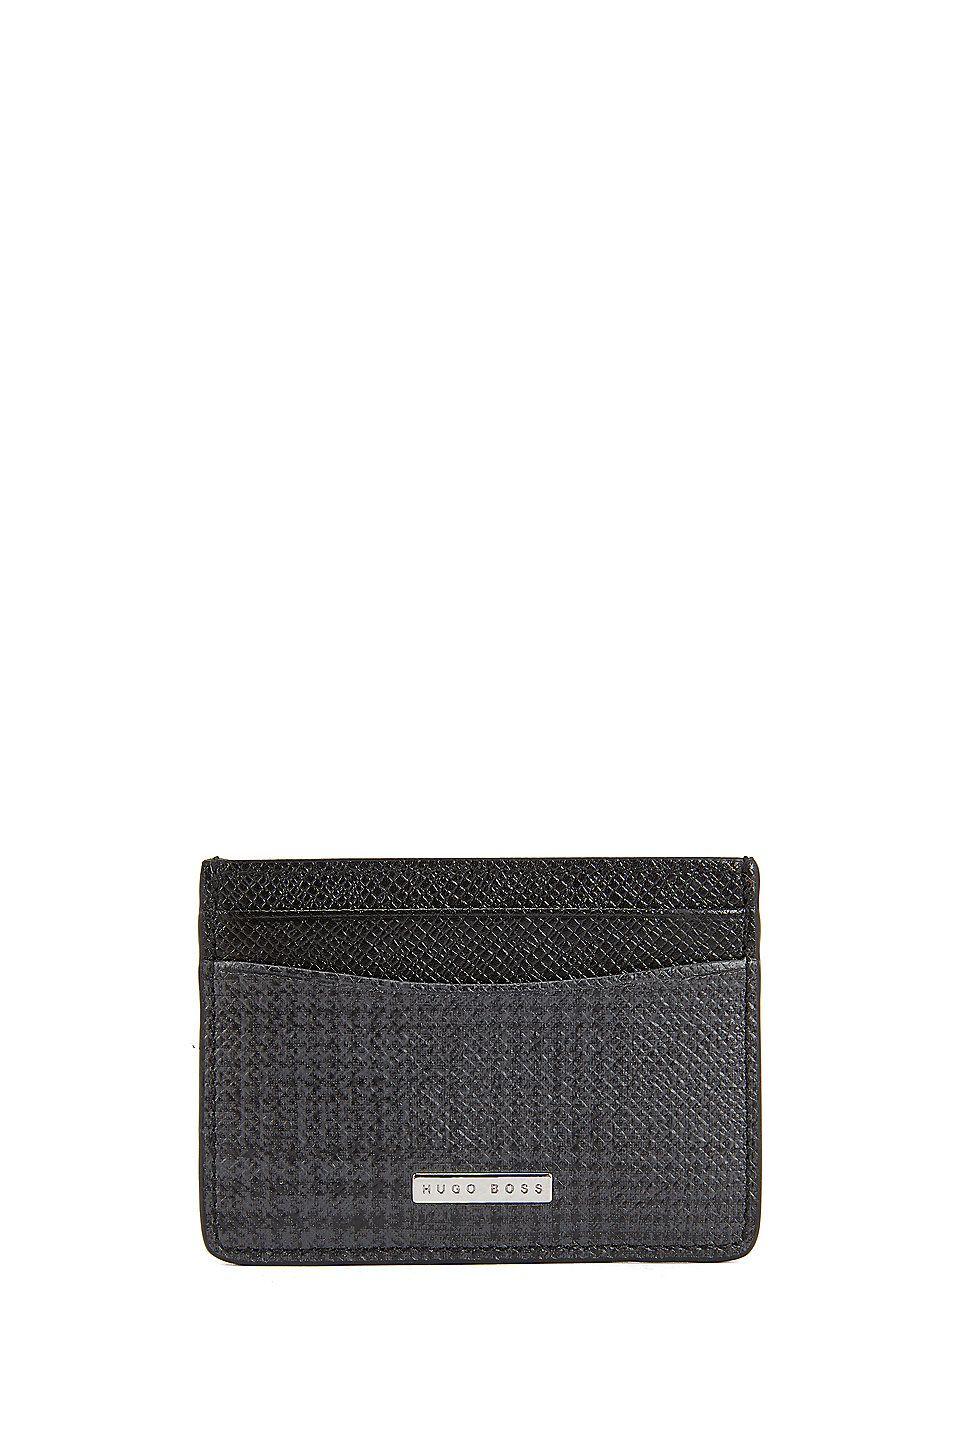 7781b7c1d9f3 HUGO BOSS Signature Collection card holder in grained palmellato leather -  Dark Red… | Accessories Men | Accessories for Men | Mens Fashion  Accessories ...